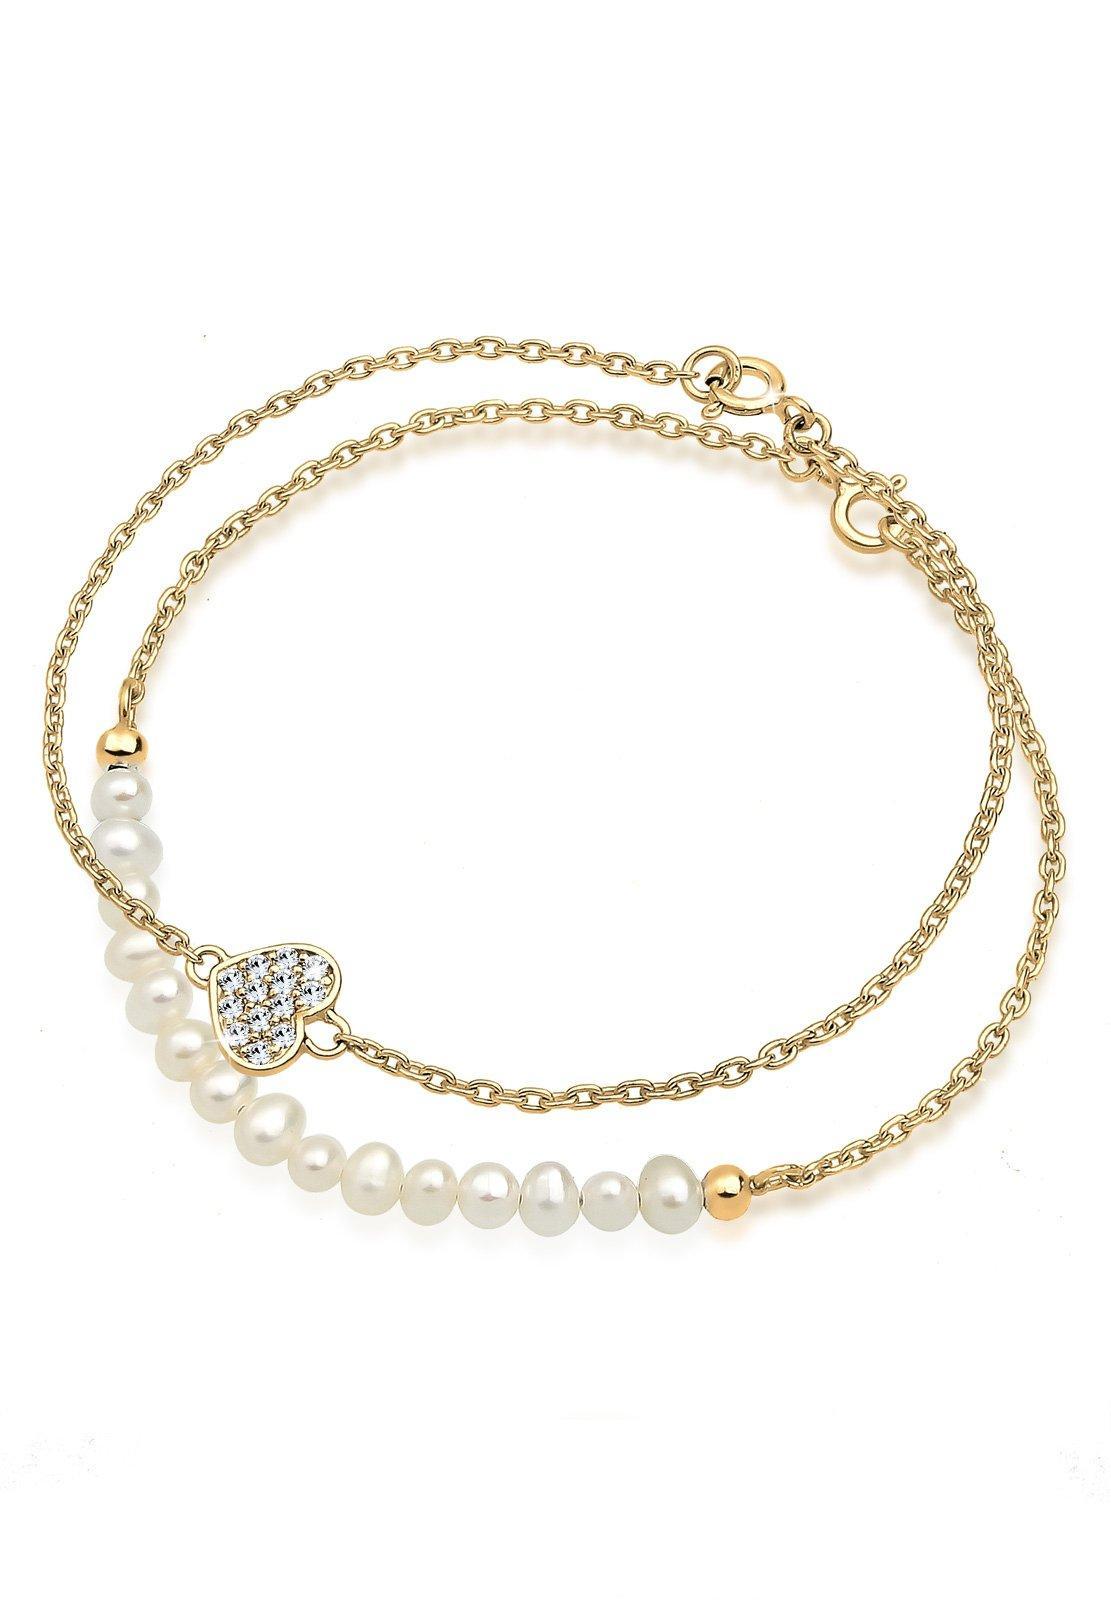 GOLDHIMMEL Perlenarmband Set Herz Layer Swarovski Kristalle Cute 925 Silber